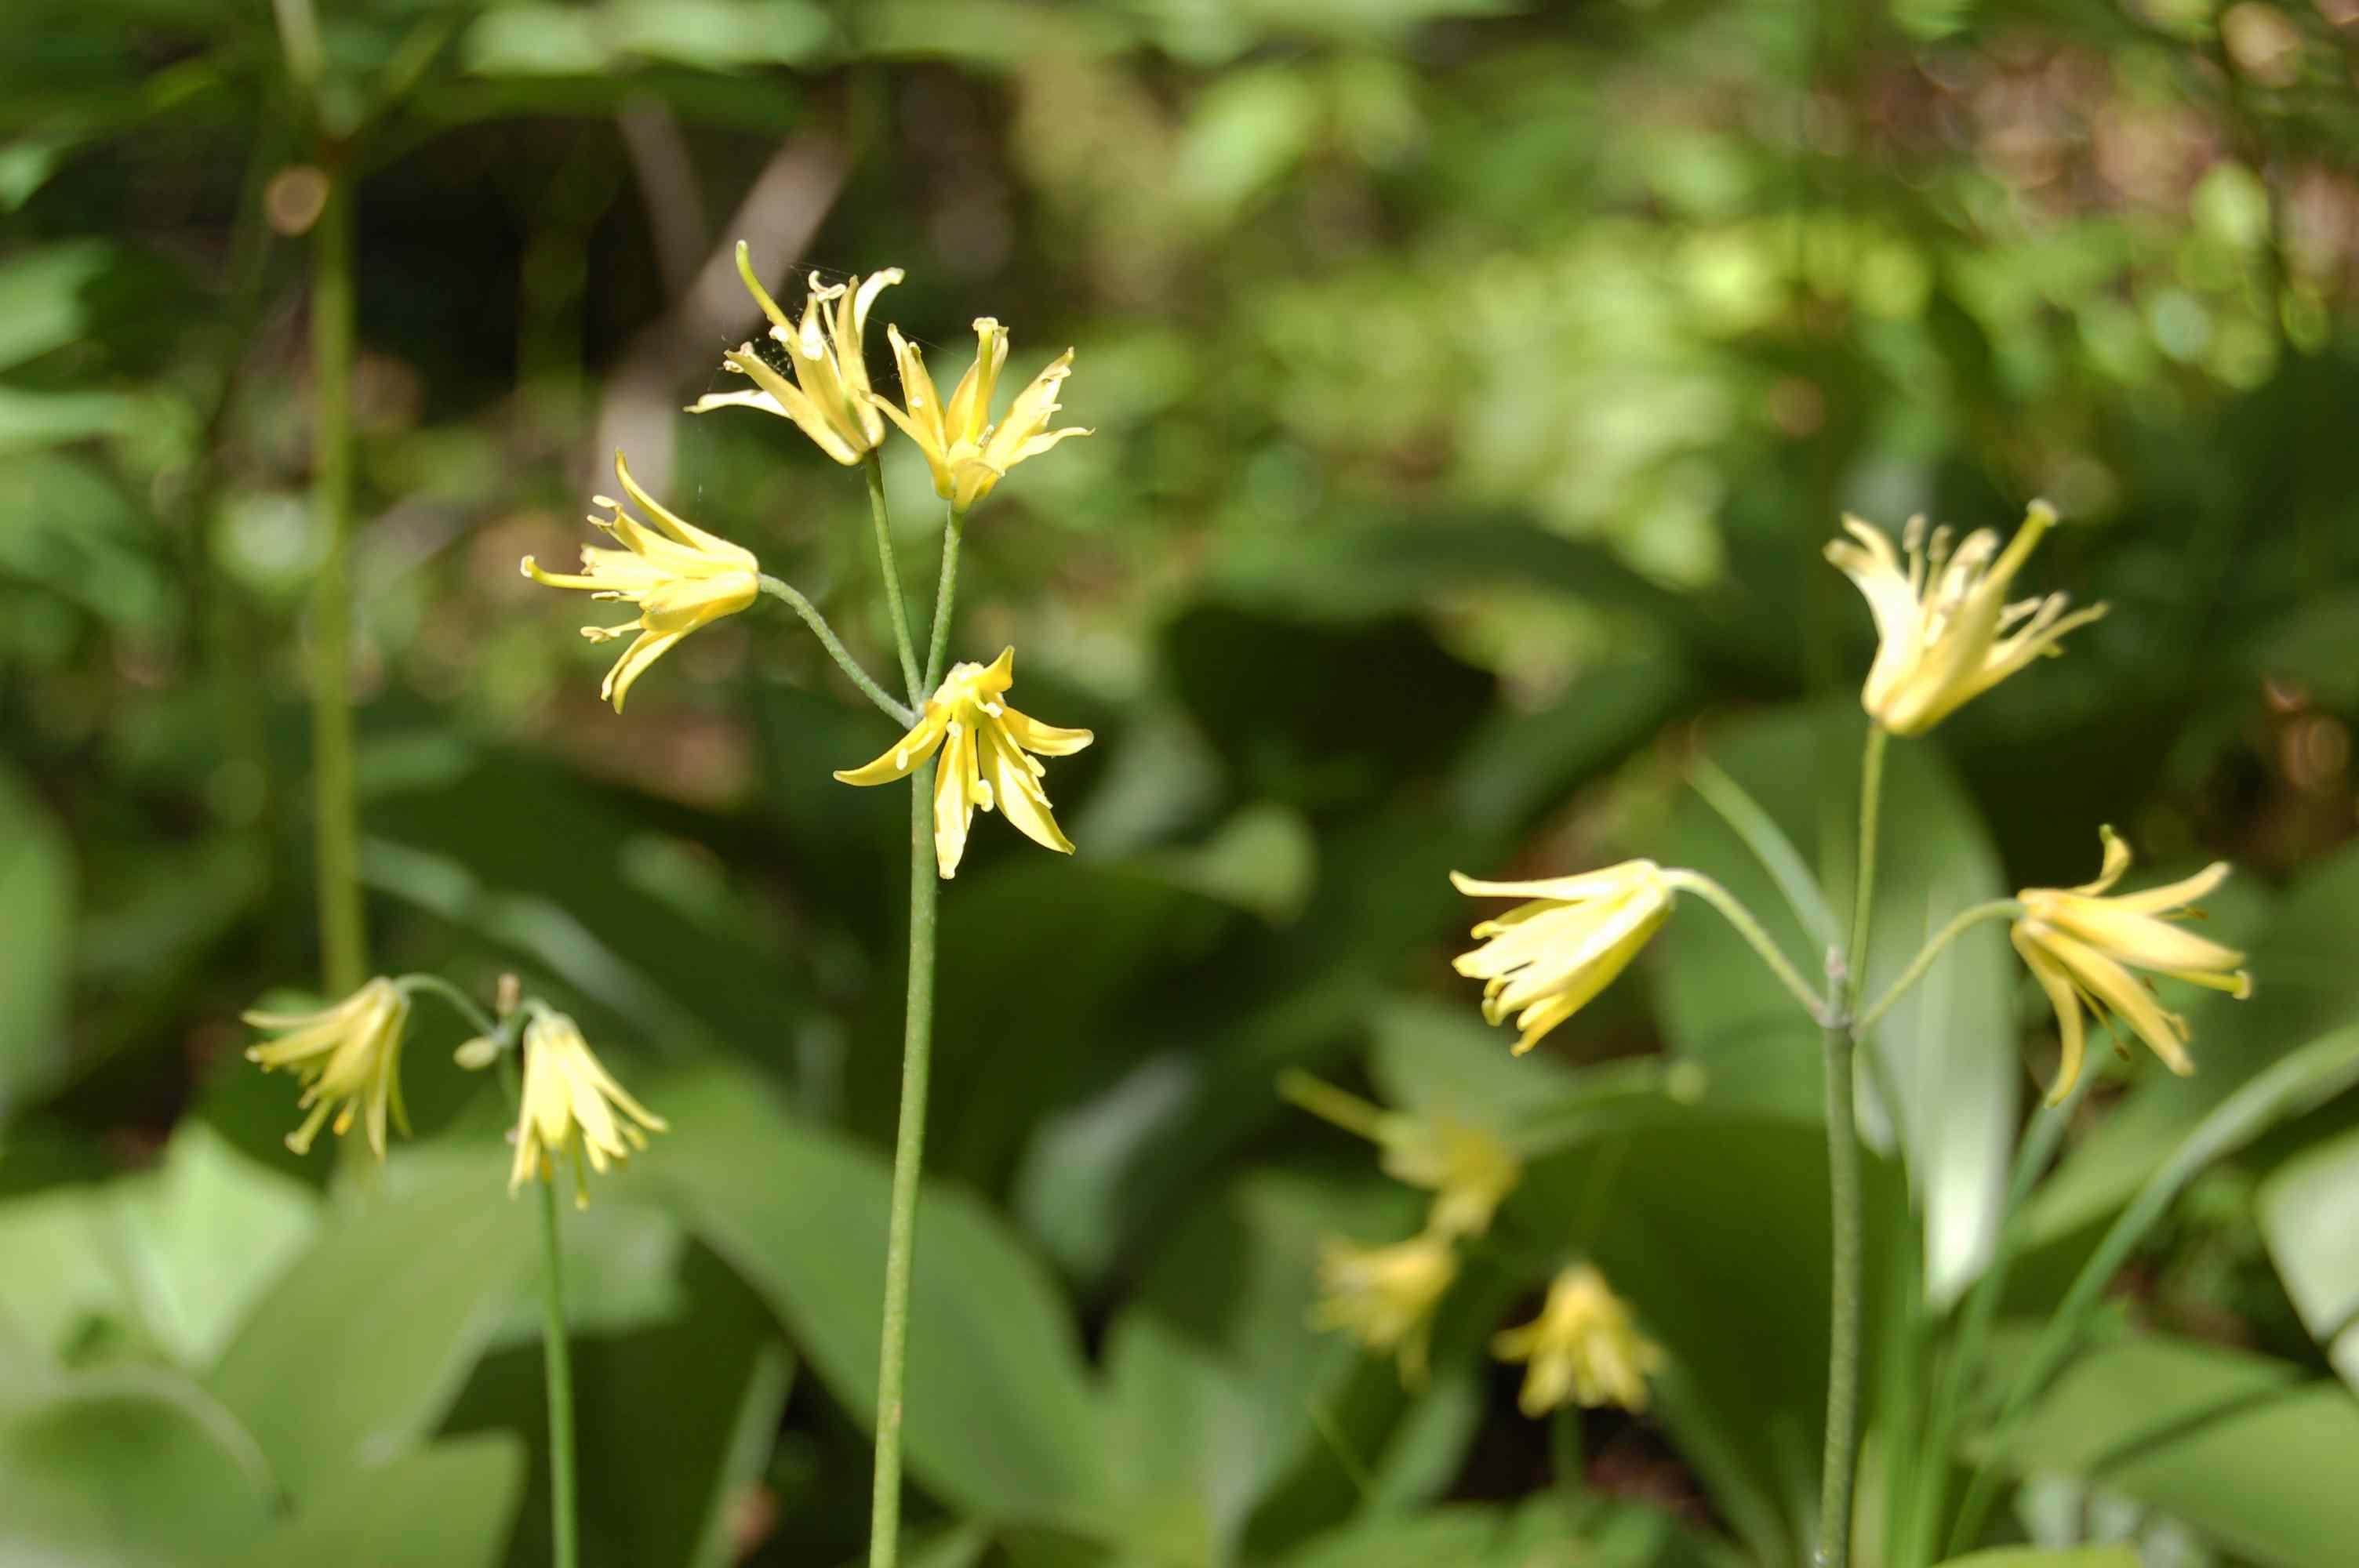 Clintonia Borealis in the Sunshine